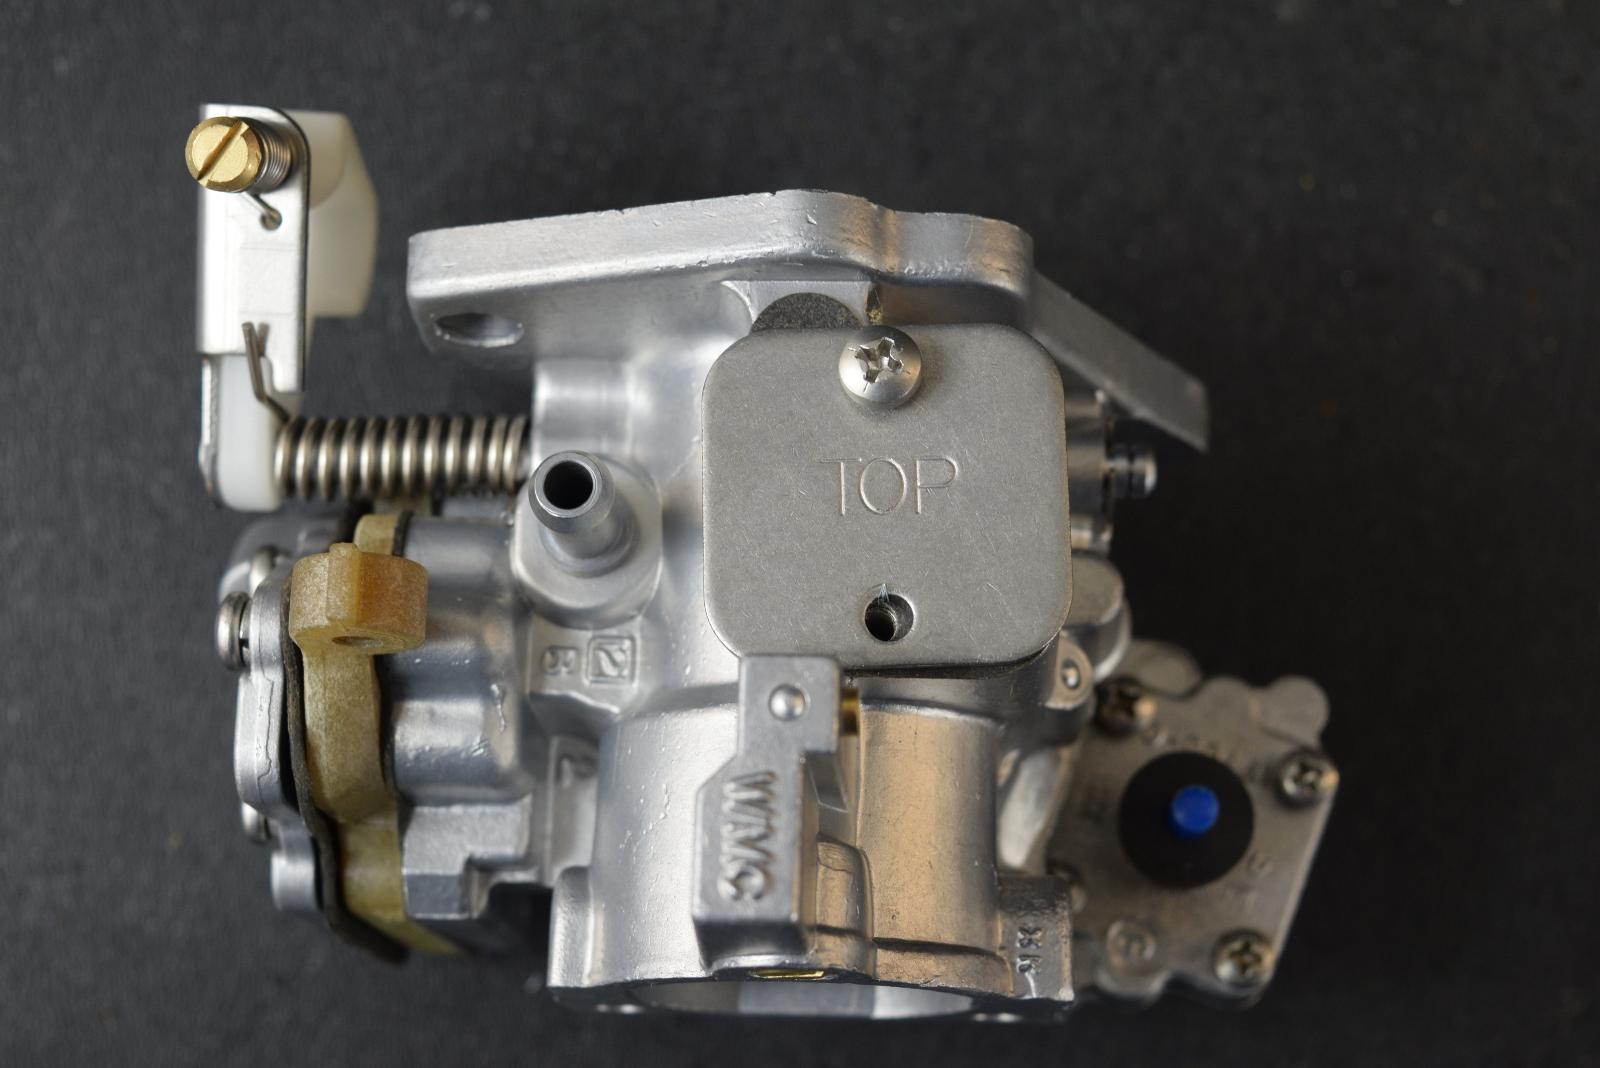 Crb Refurbished Mercury Carburetor T Wmc Wmc Hp on Carburetor For Mercury Outboards